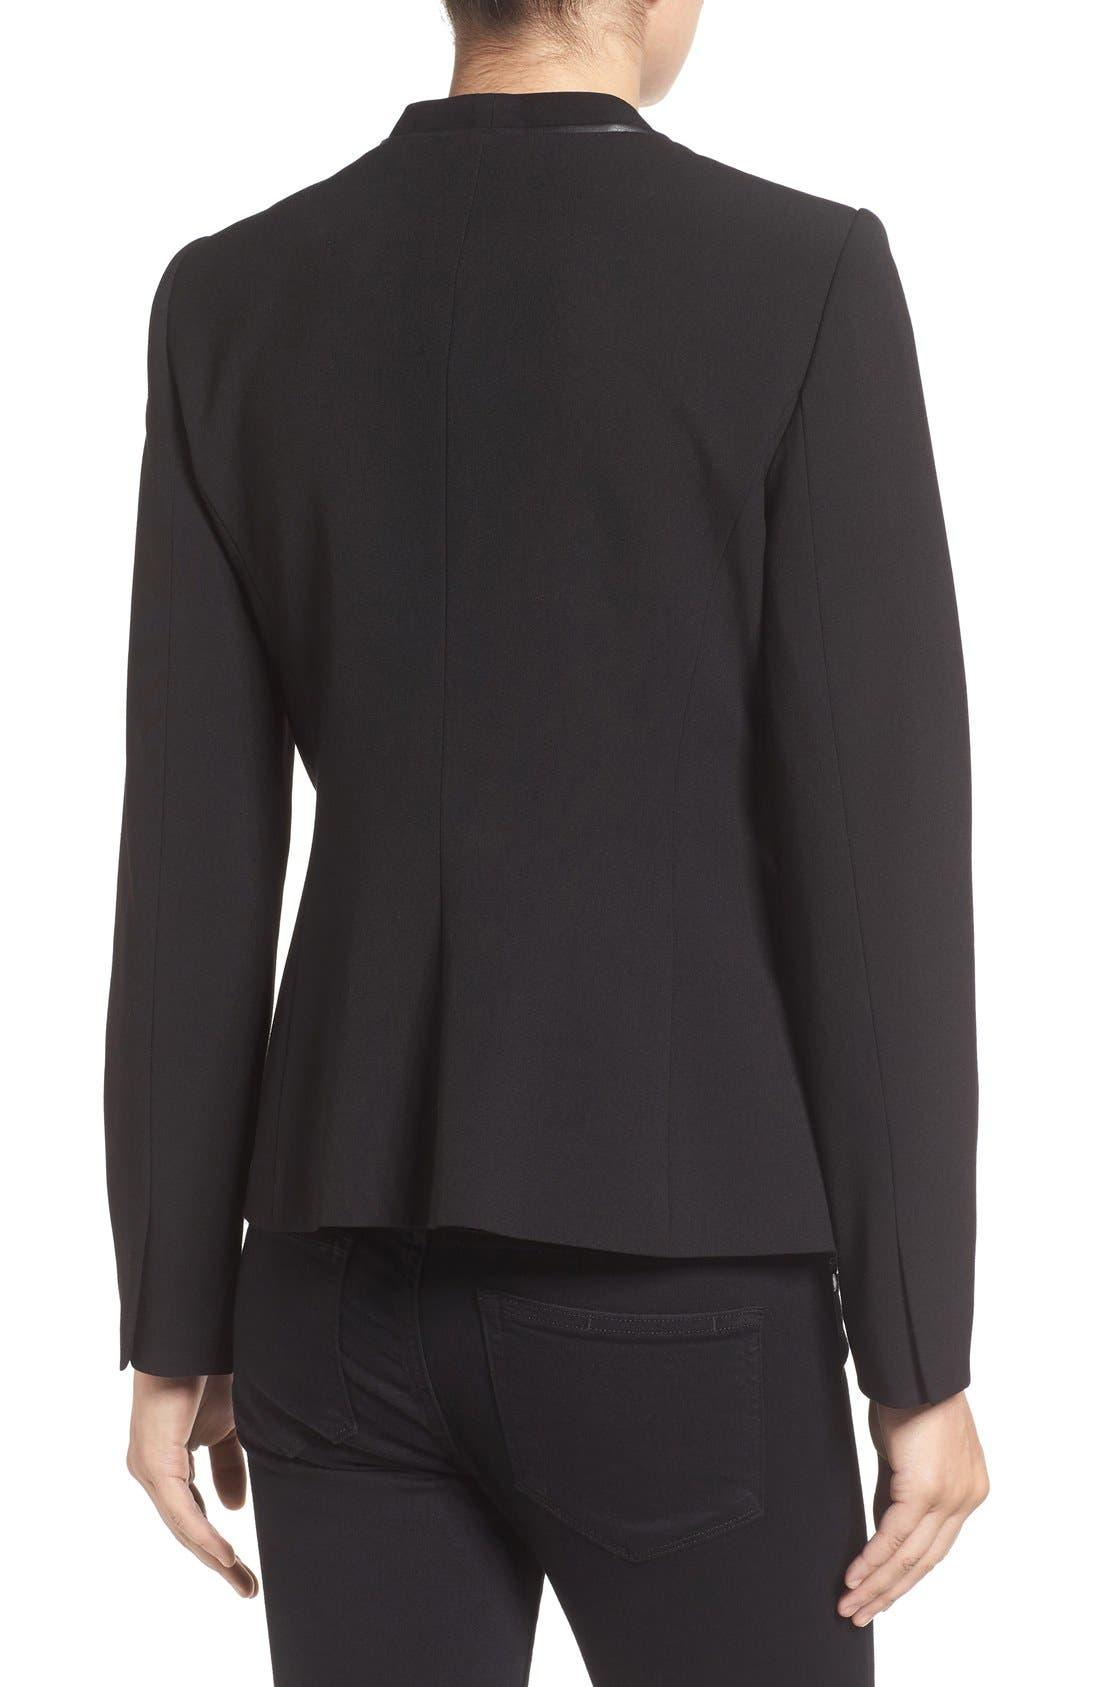 Alternate Image 2  - Ivanka Trump Faux Leather Trim Suit Jacket